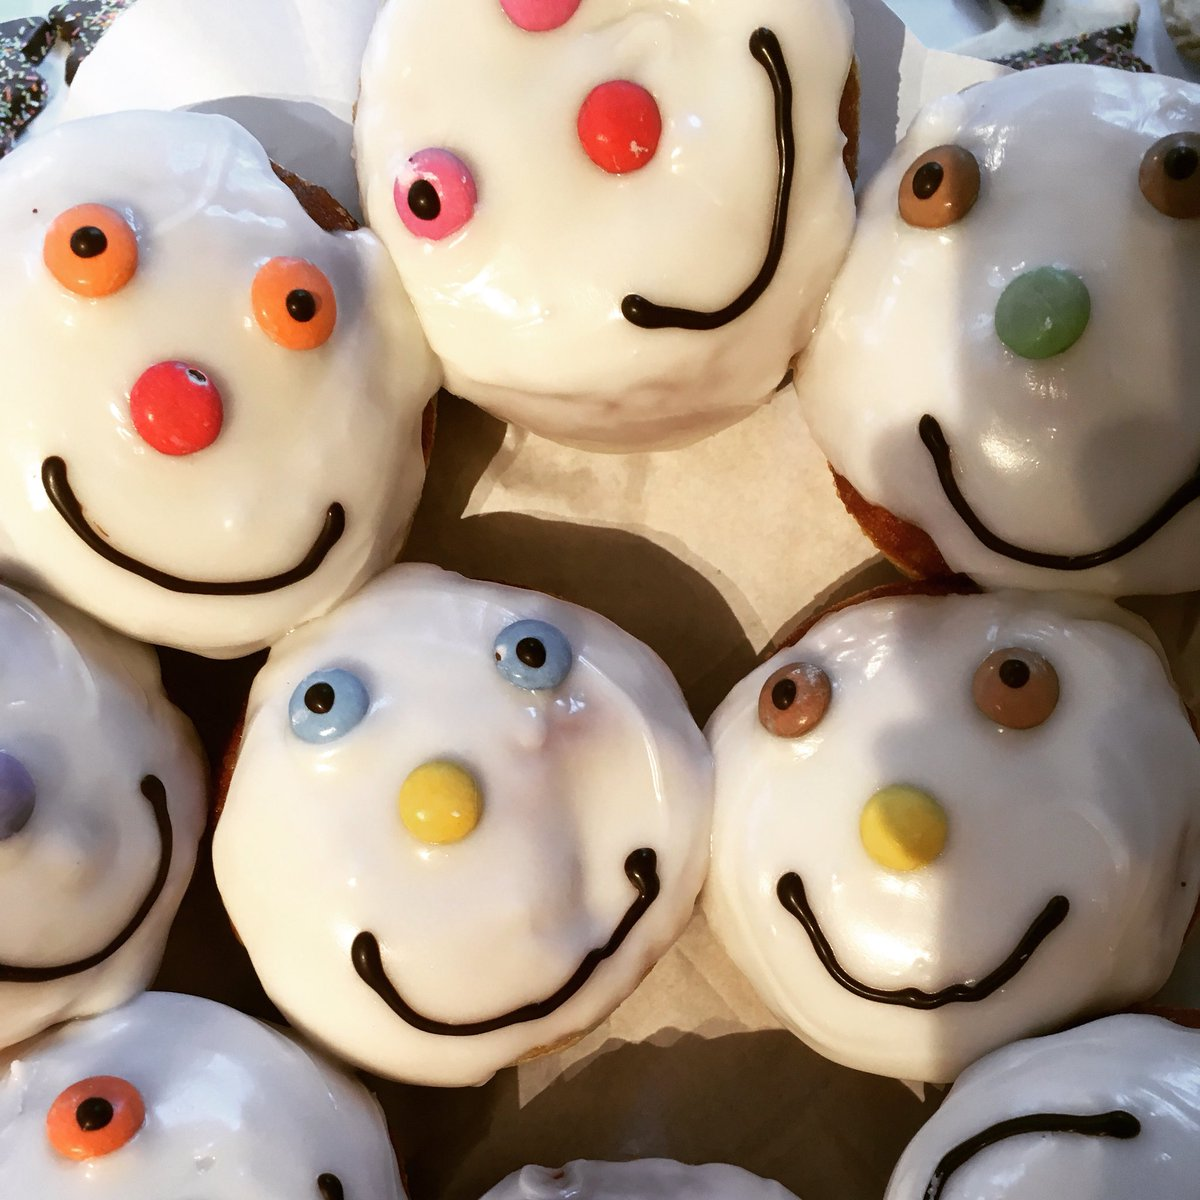 Cavan Bakery On Twitter Smiley Face Friday Cavanbakery Bakery